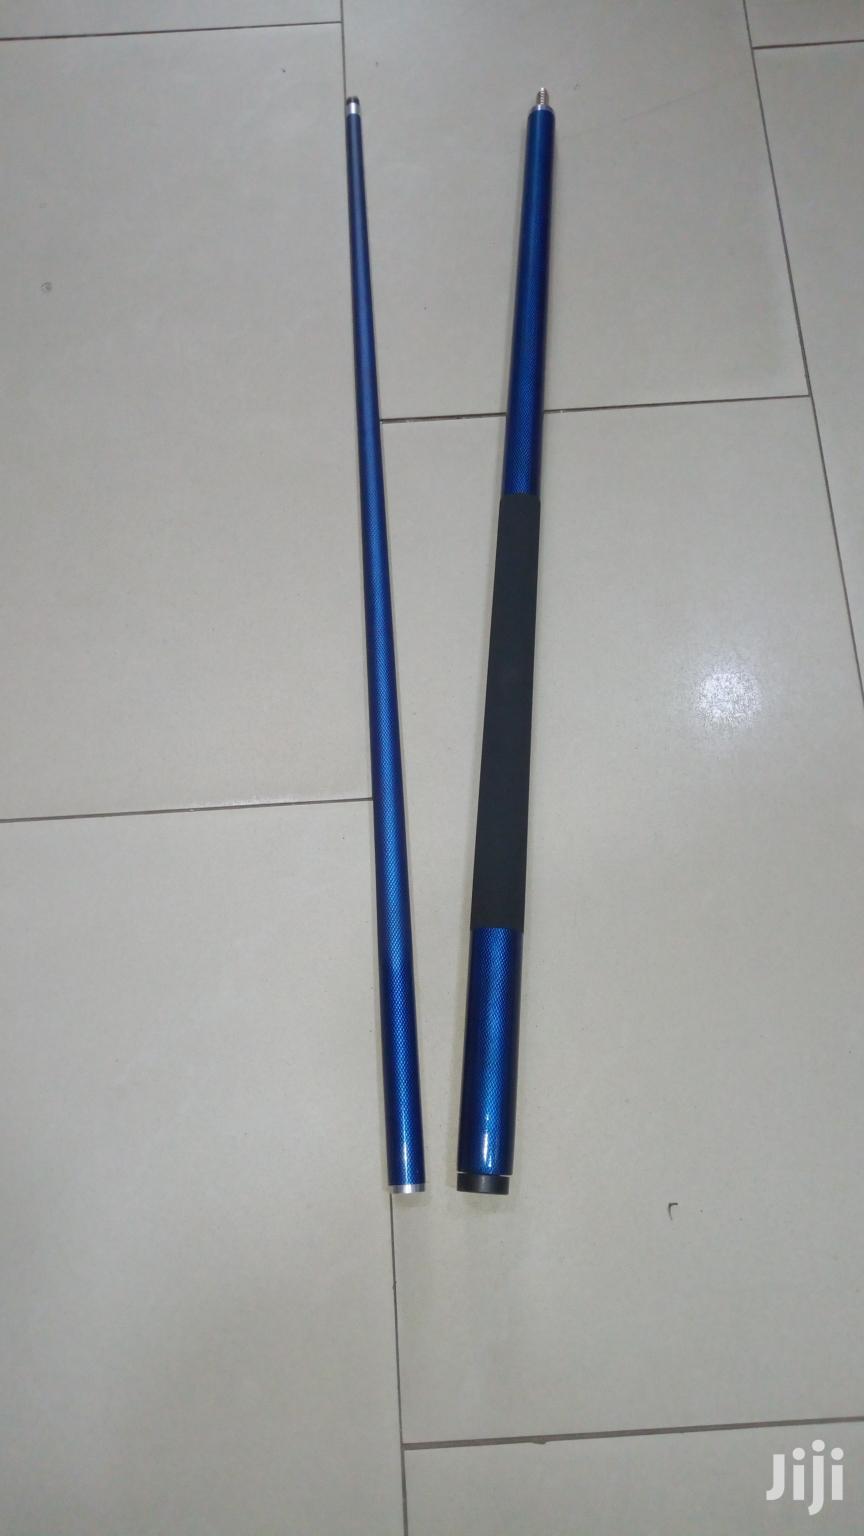 Original Cue Stick for Snooker | Sports Equipment for sale in Lekki, Lagos State, Nigeria